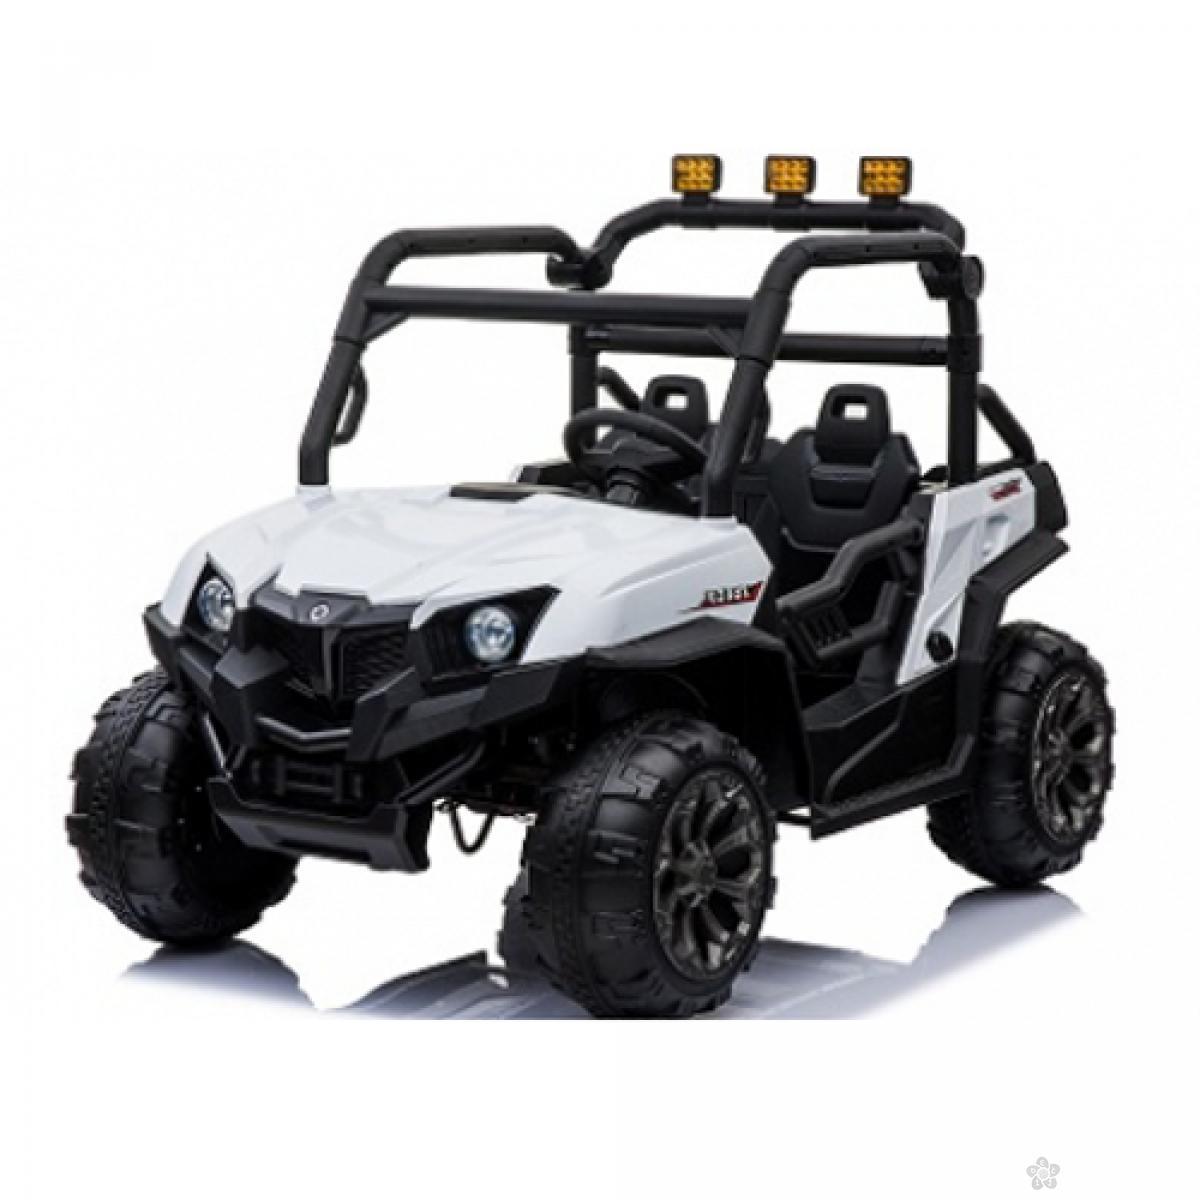 Bagi (quad) dvosed, model 309 BELI